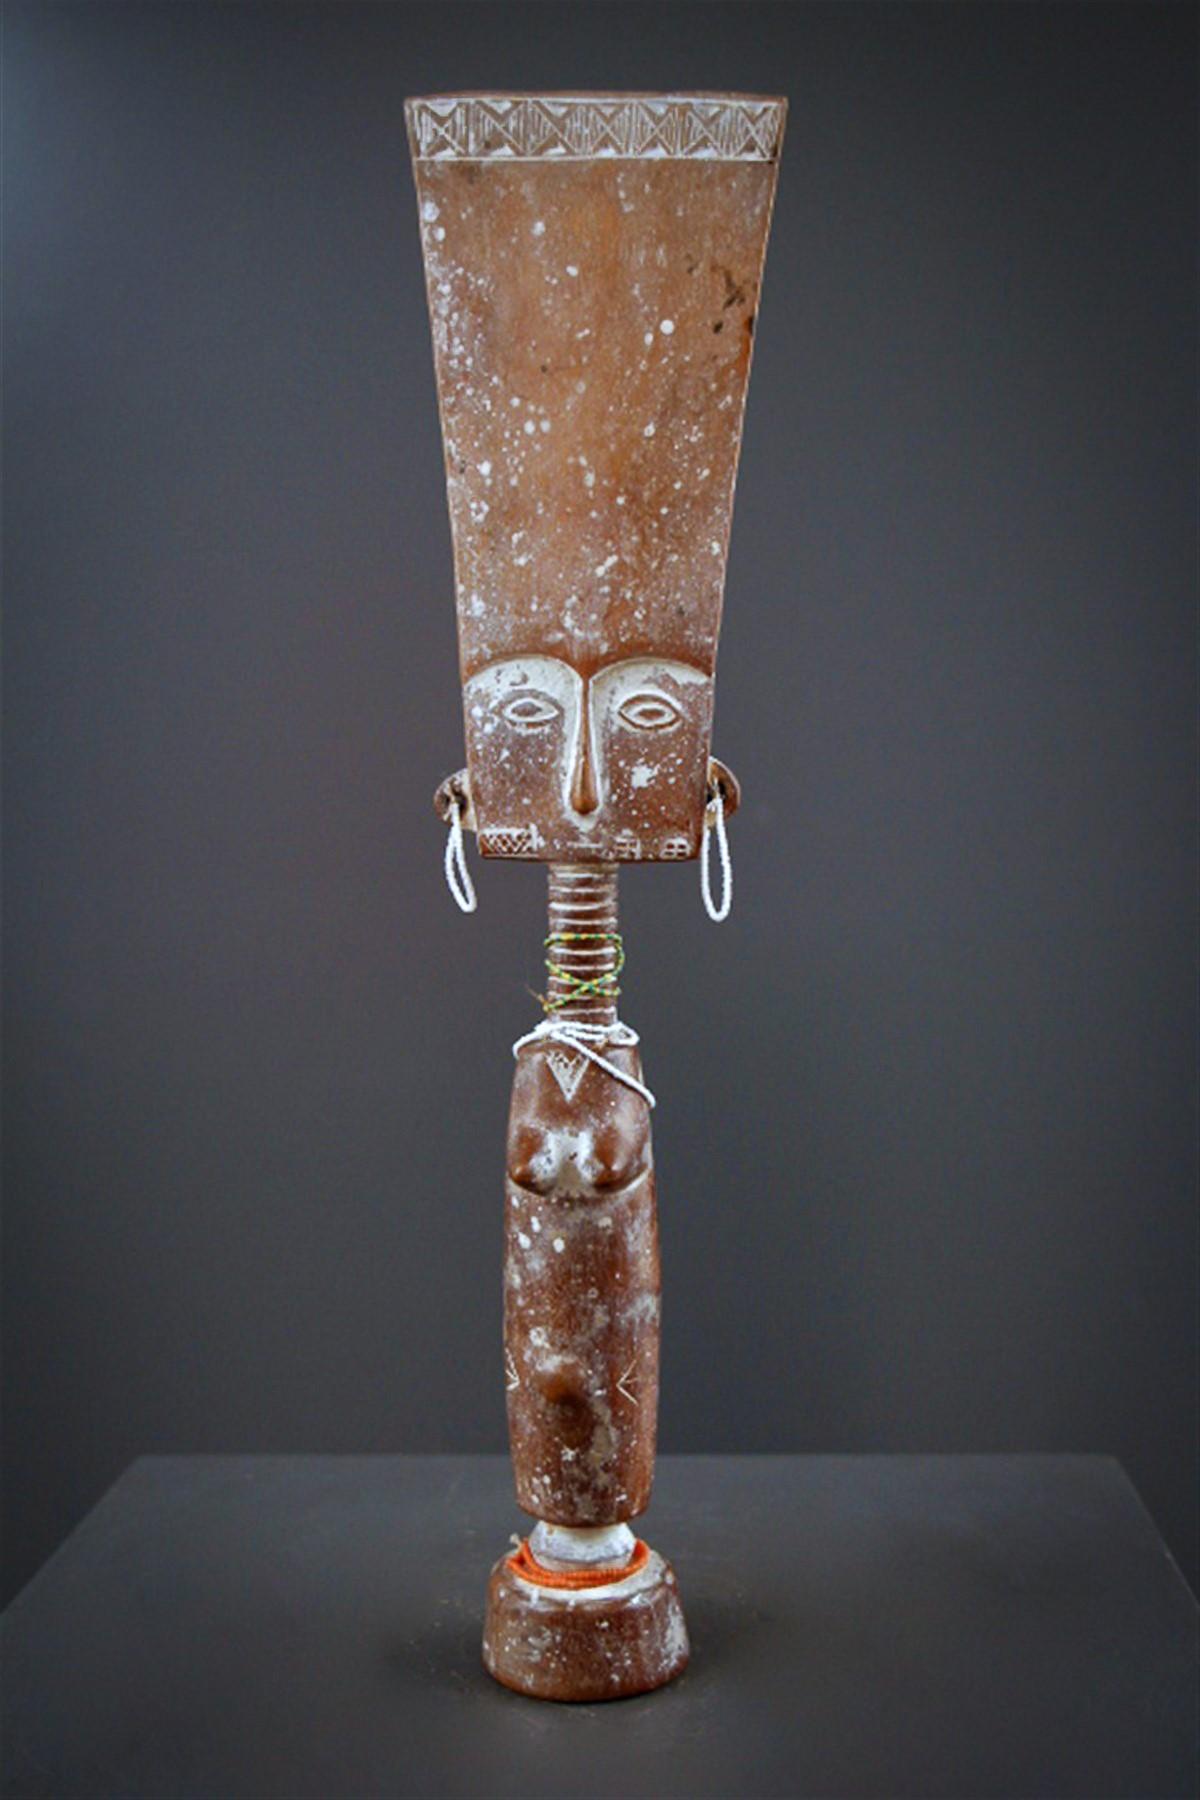 Fanti Doll - African art